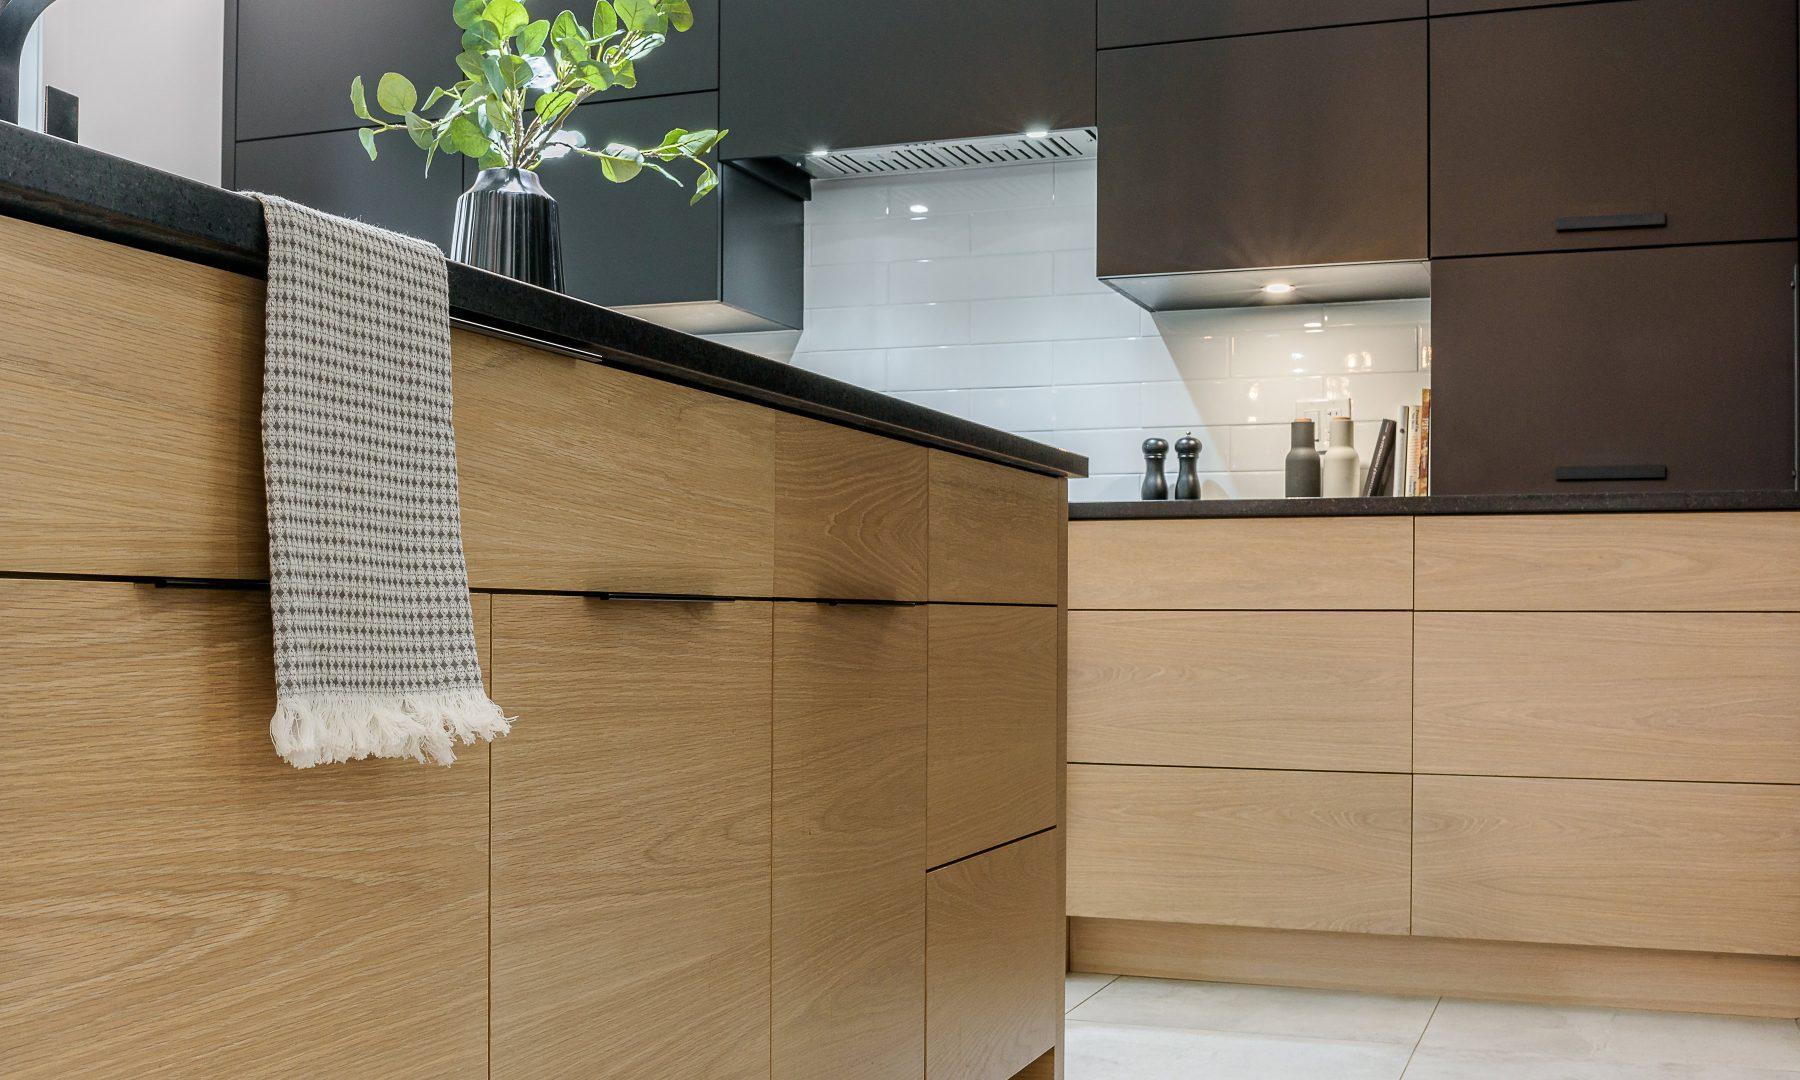 Cabico Custom Cabinets - Projet cuisine Greenwood - vue rapprochée